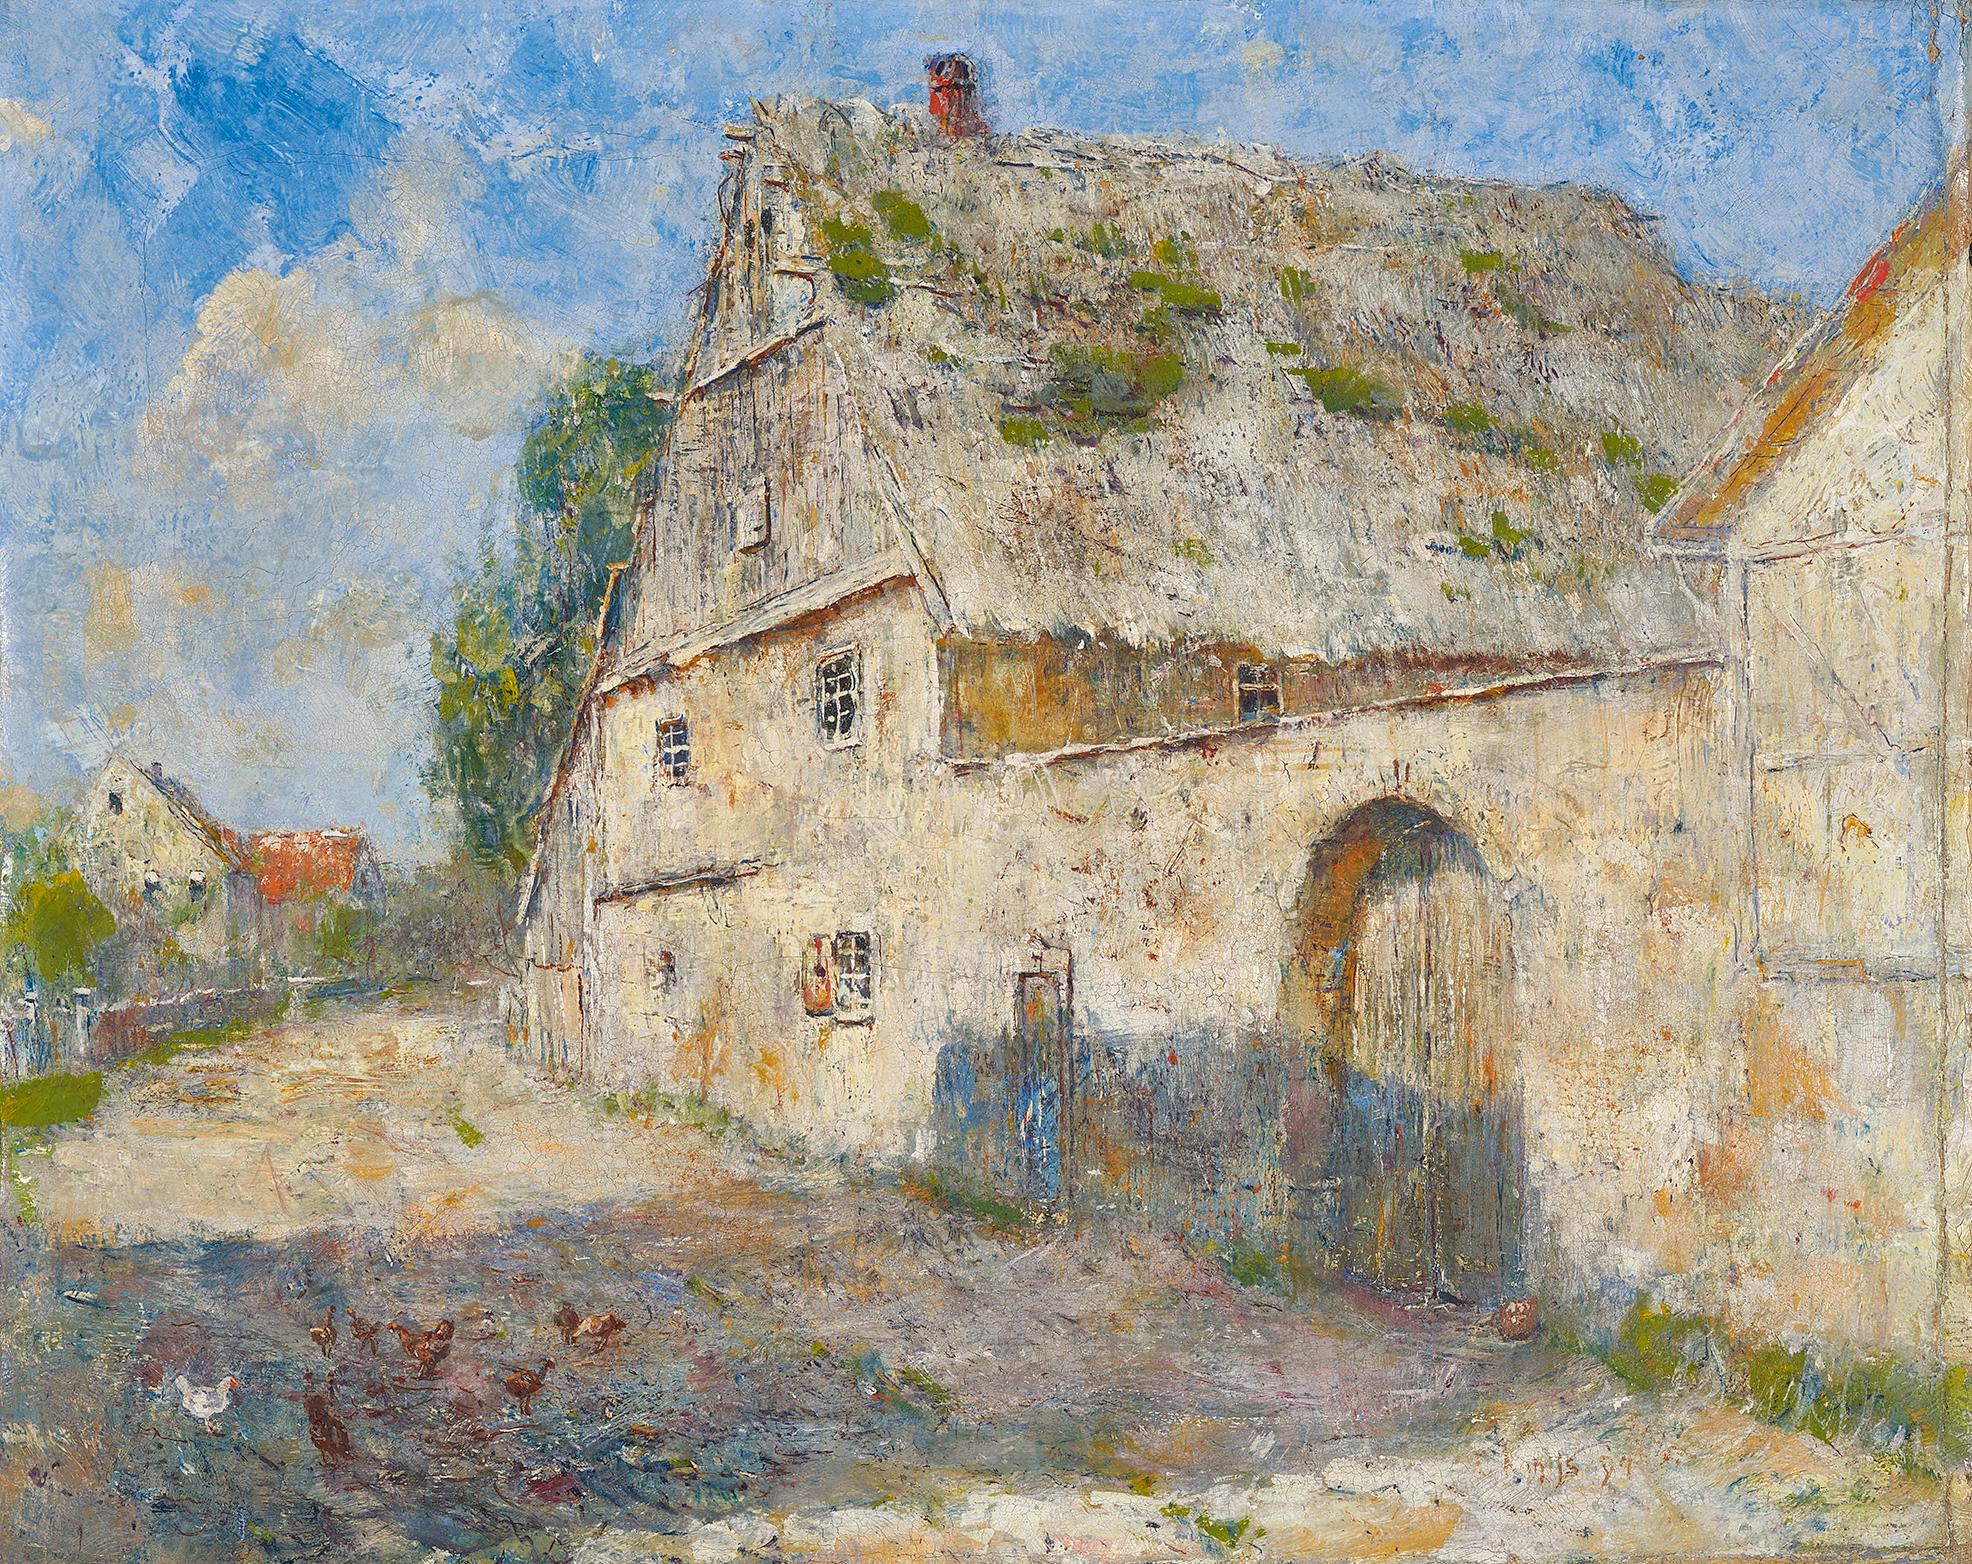 Rohlfs Christian, Bauernhof (Farmhouse)